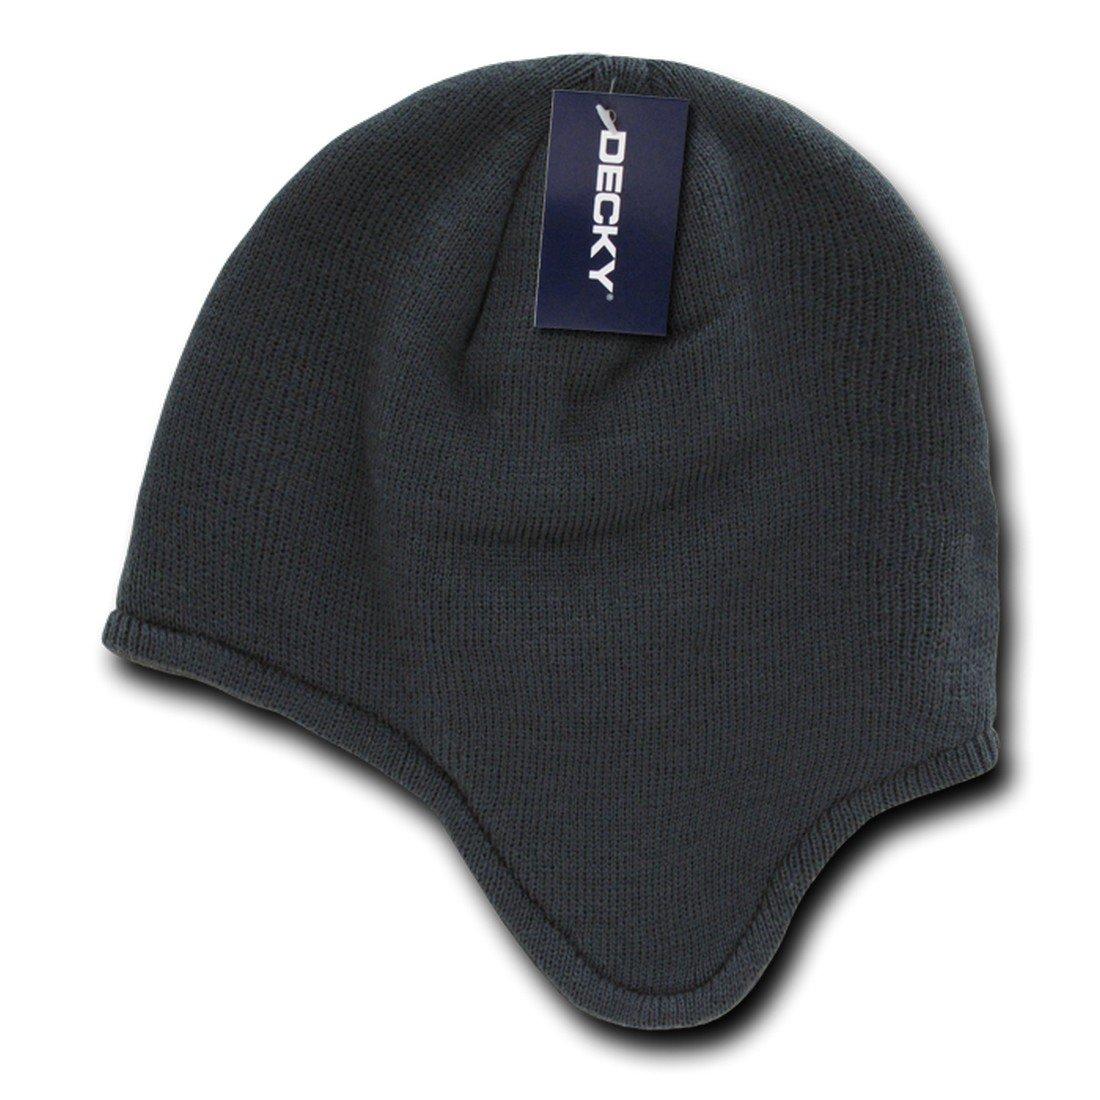 Decky Inc Helmet Style Ear Flap Snug Fit Beanie Skull Hat 616 BEANIE-616